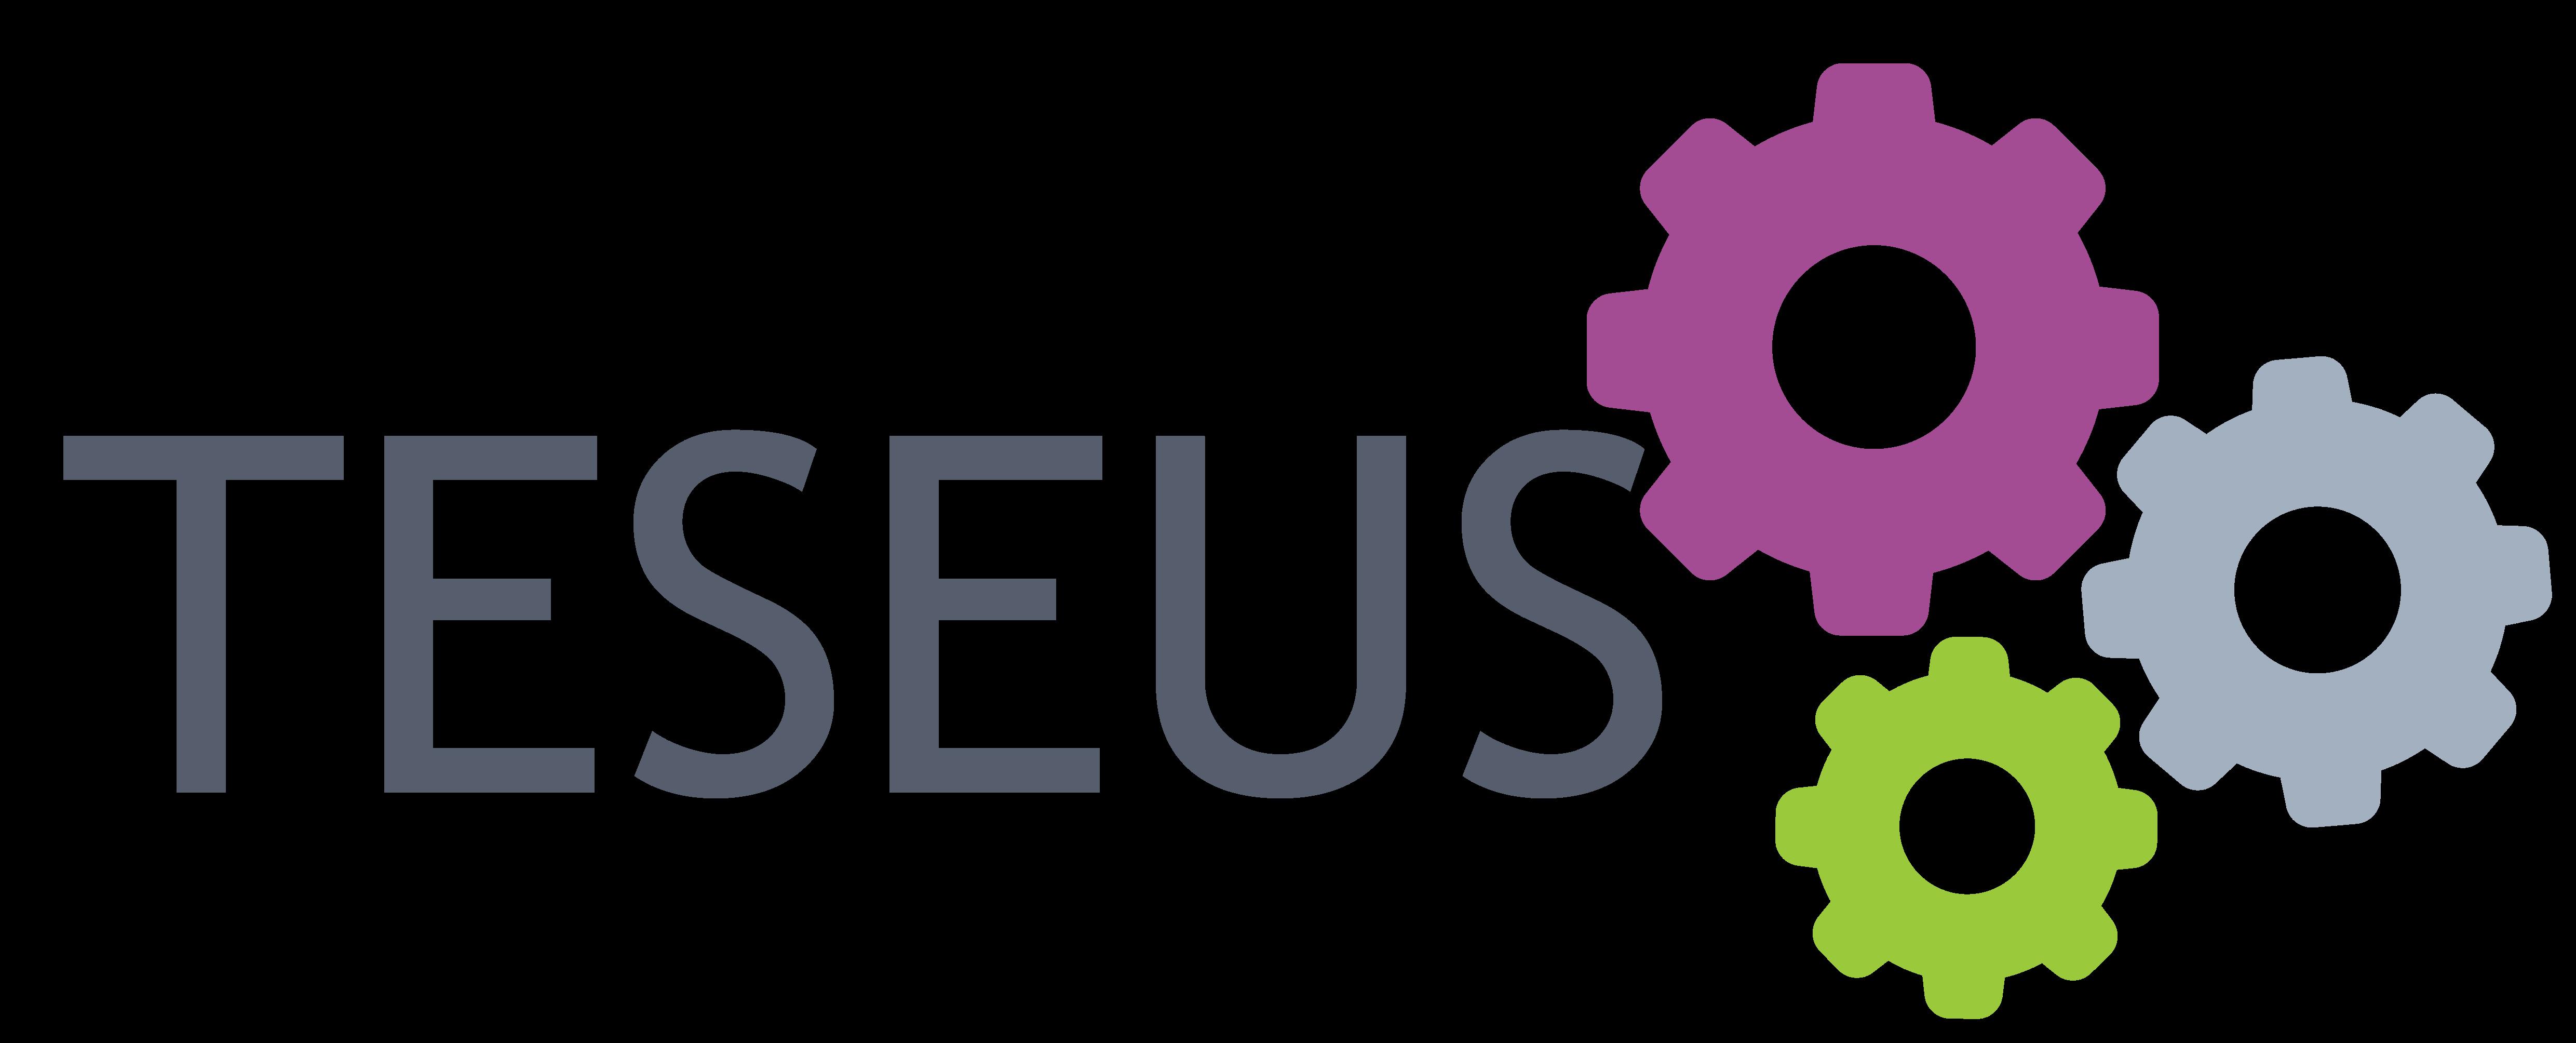 Proyecto Teseus